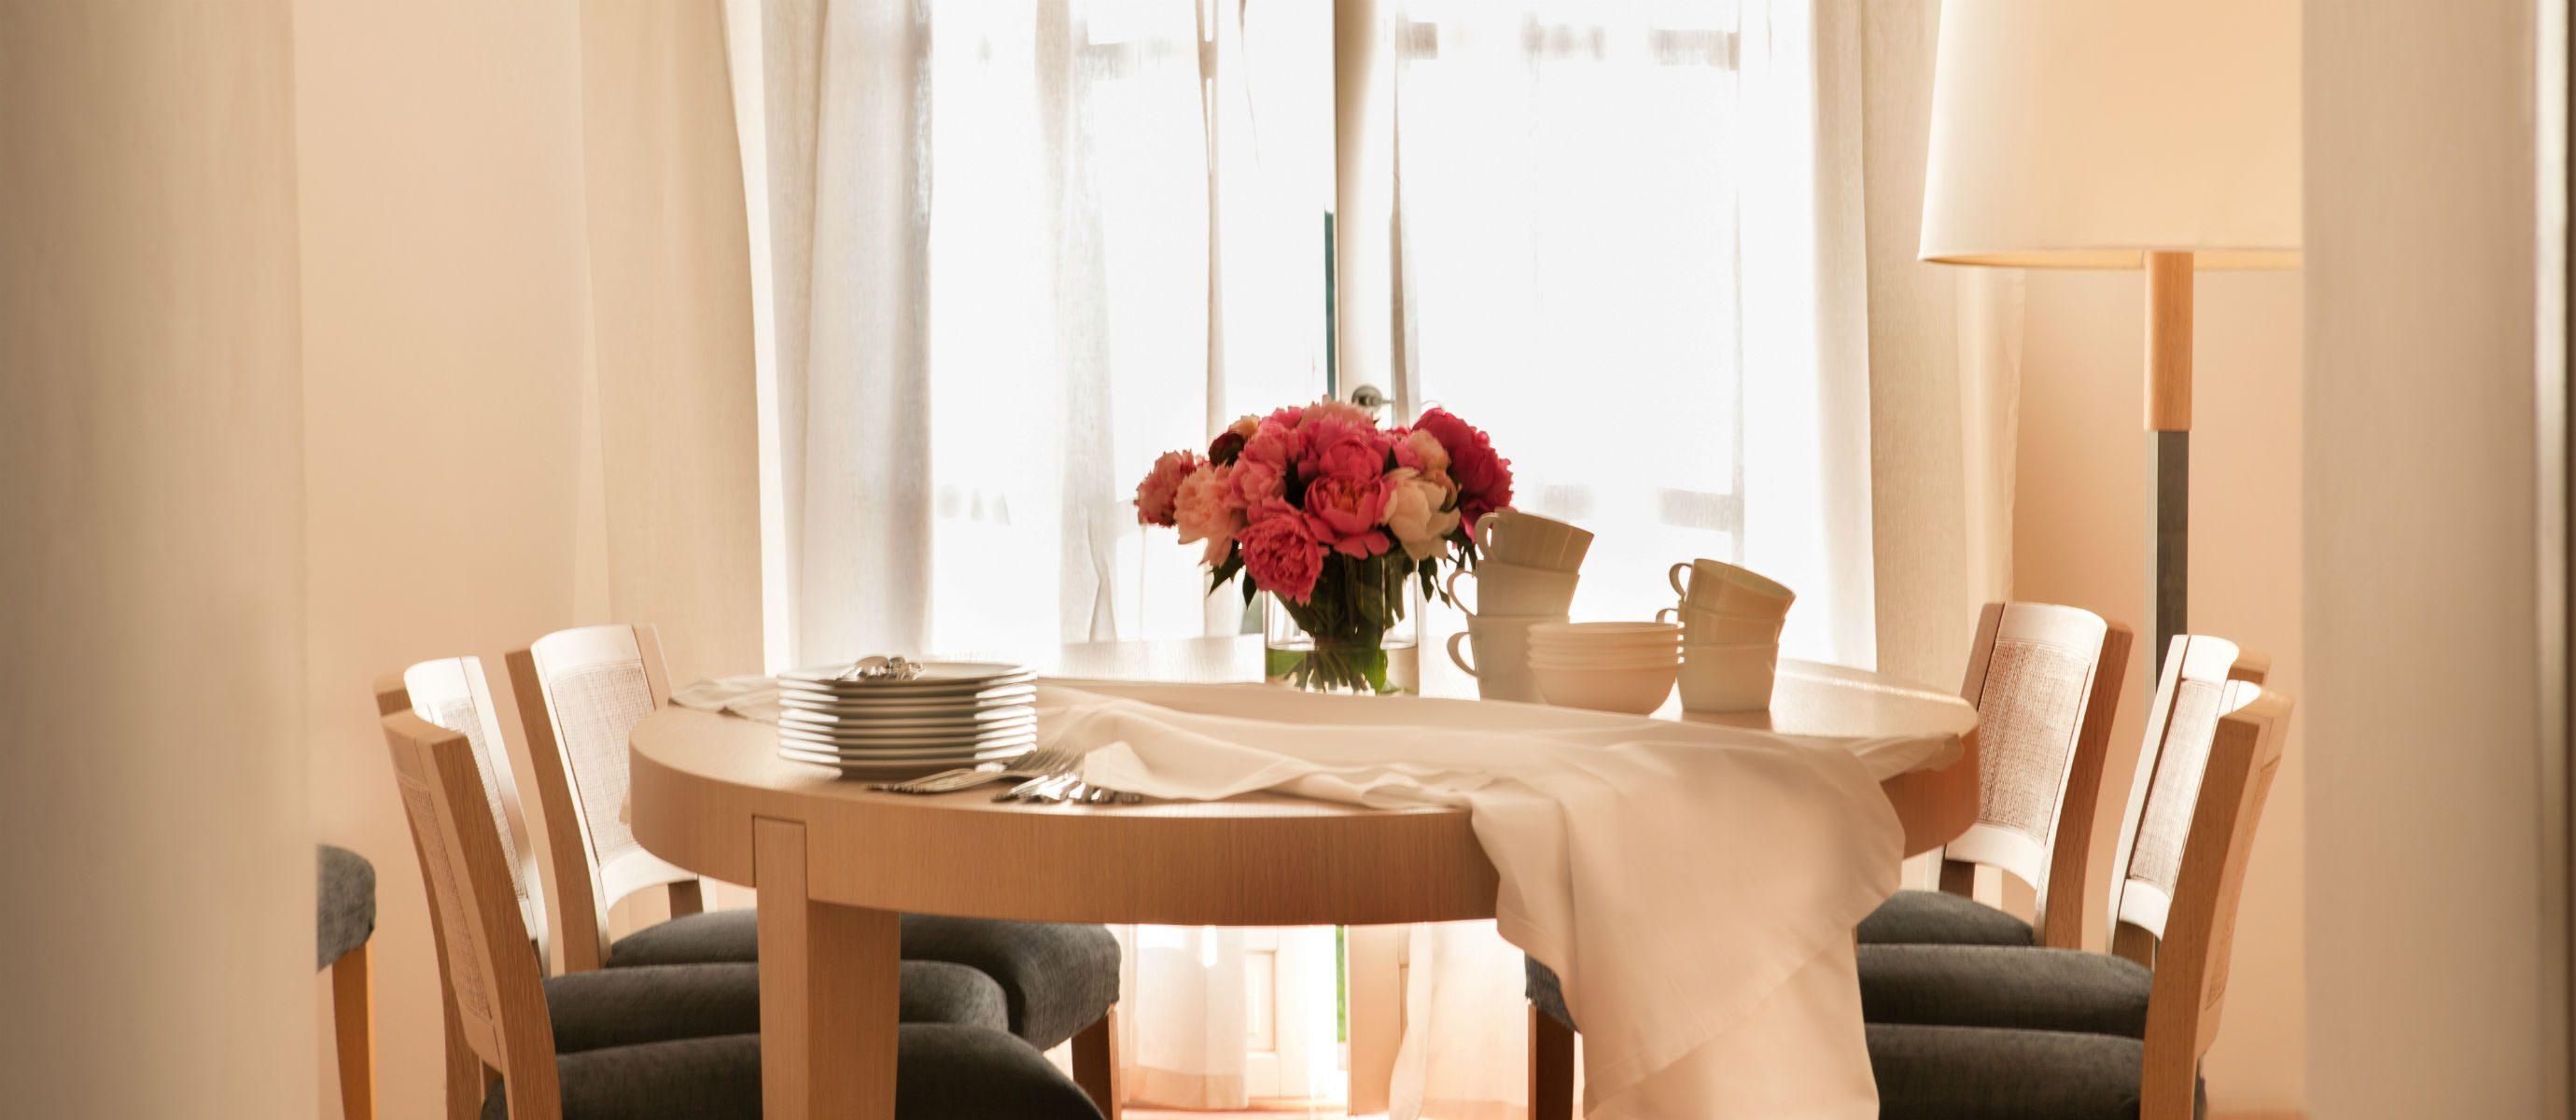 Villla-12-La-Reserve-Ramatuelle-Dining-room.MAIN3